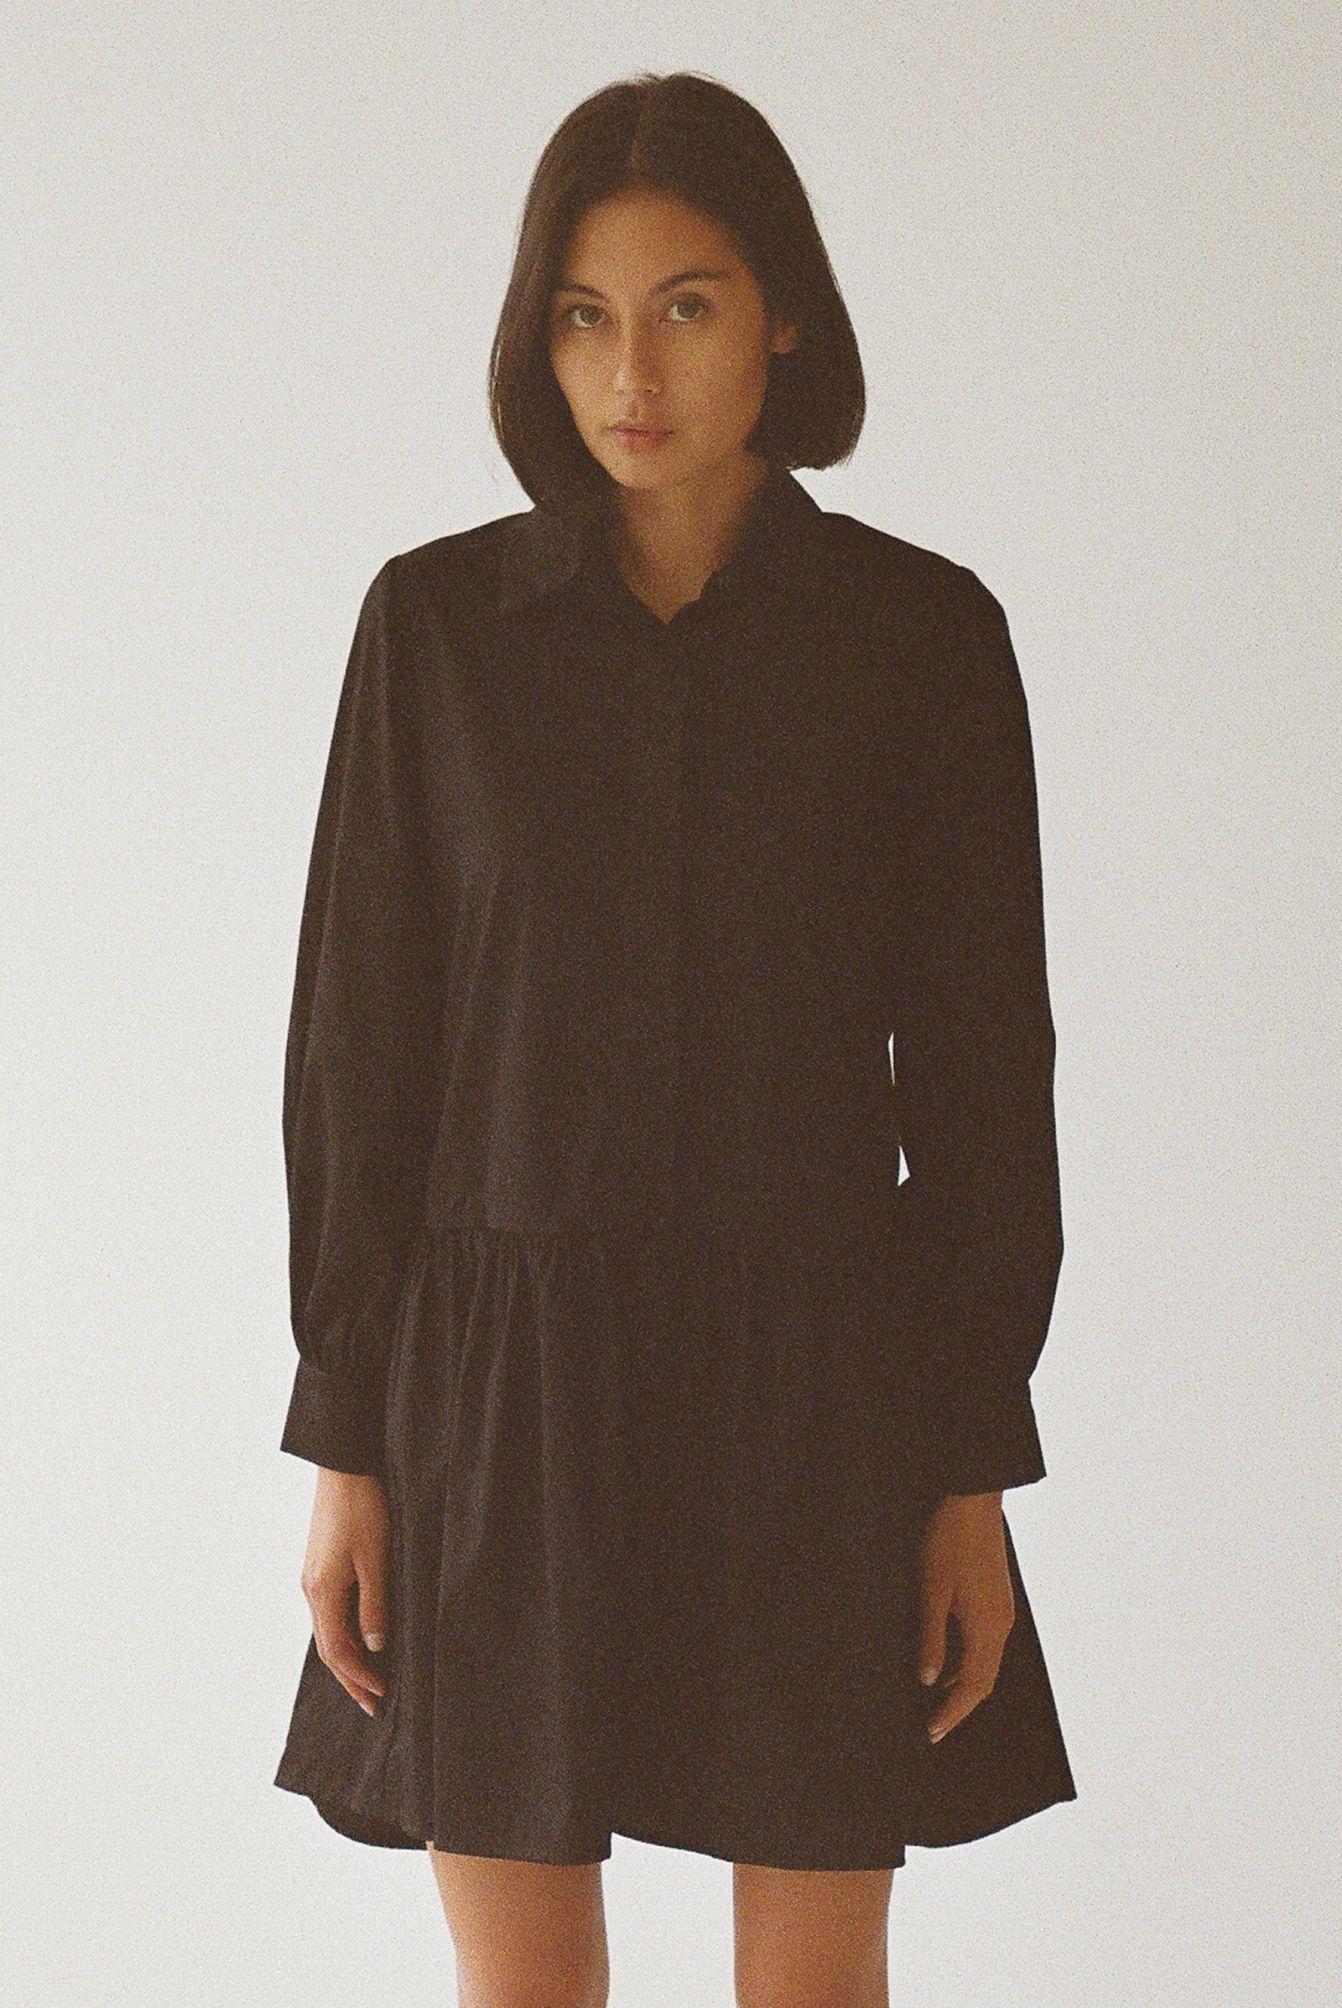 Mes dress black - Ellis Label - Signature shirt dress - Made to order_0011_83070022